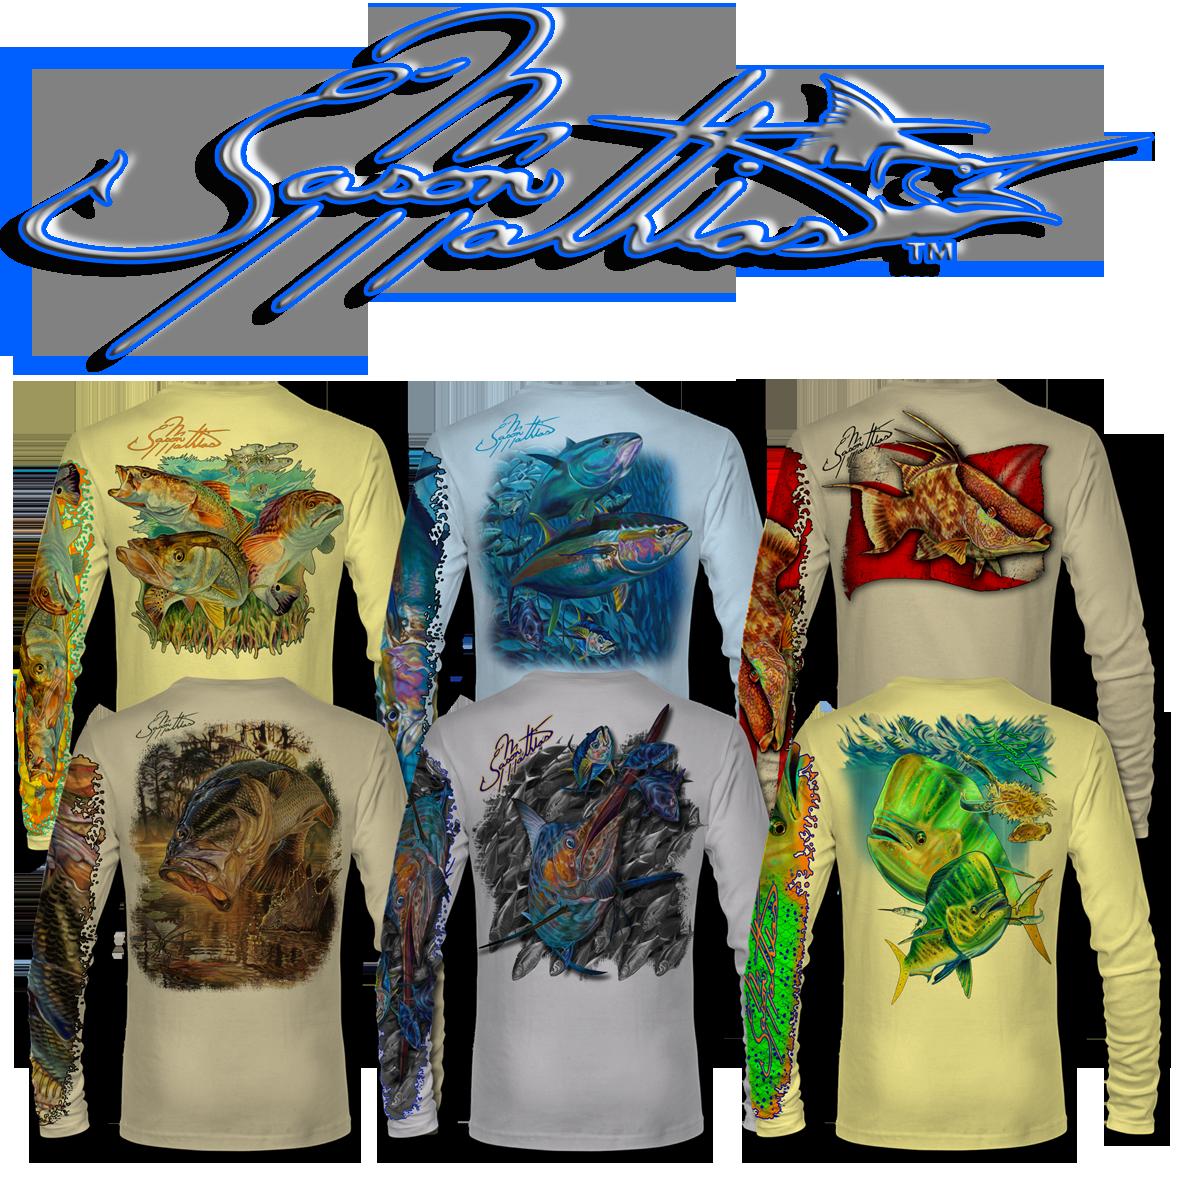 jason-mathias-shirt-line-for-gamefisherman-sportfisherman-divers-sperfishing-gear-apparel-performance-wear.png